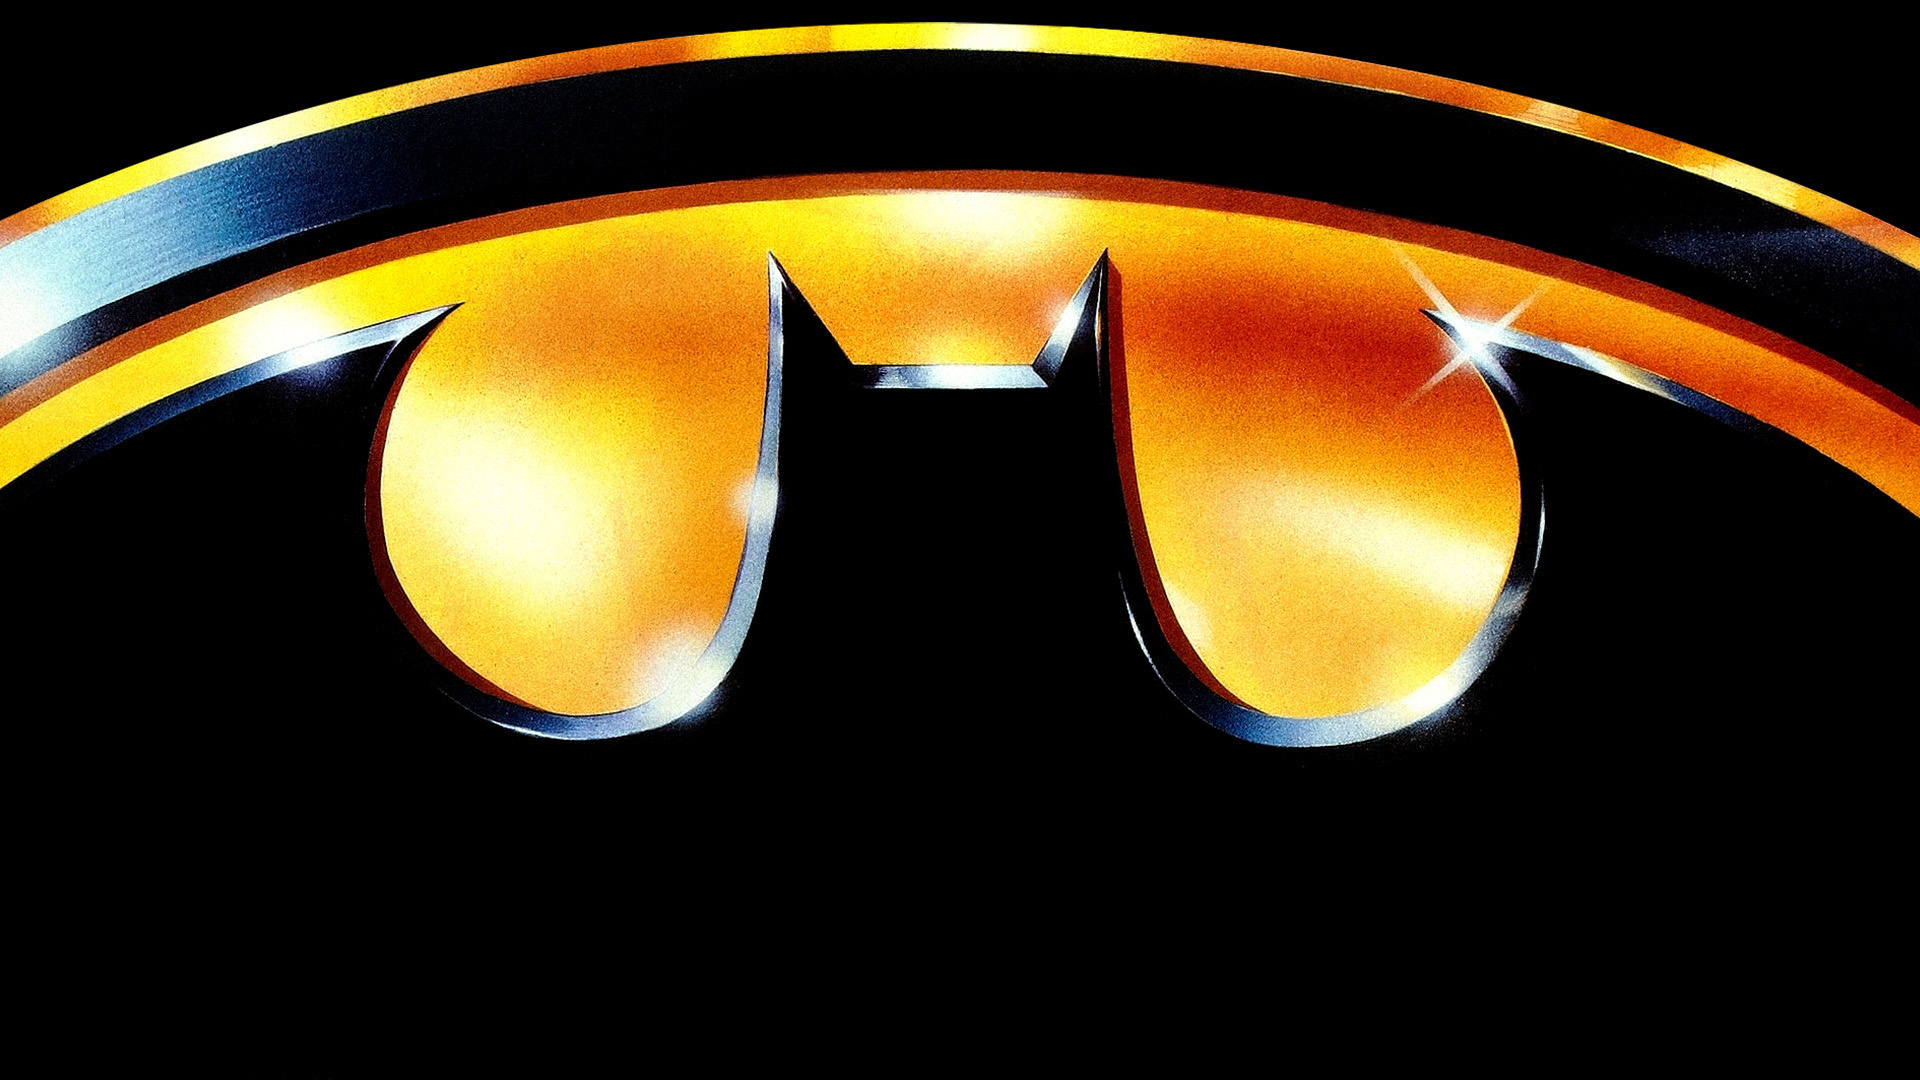 Batman HD Wallpaper | Background Image | 1920x1080 | ID ...